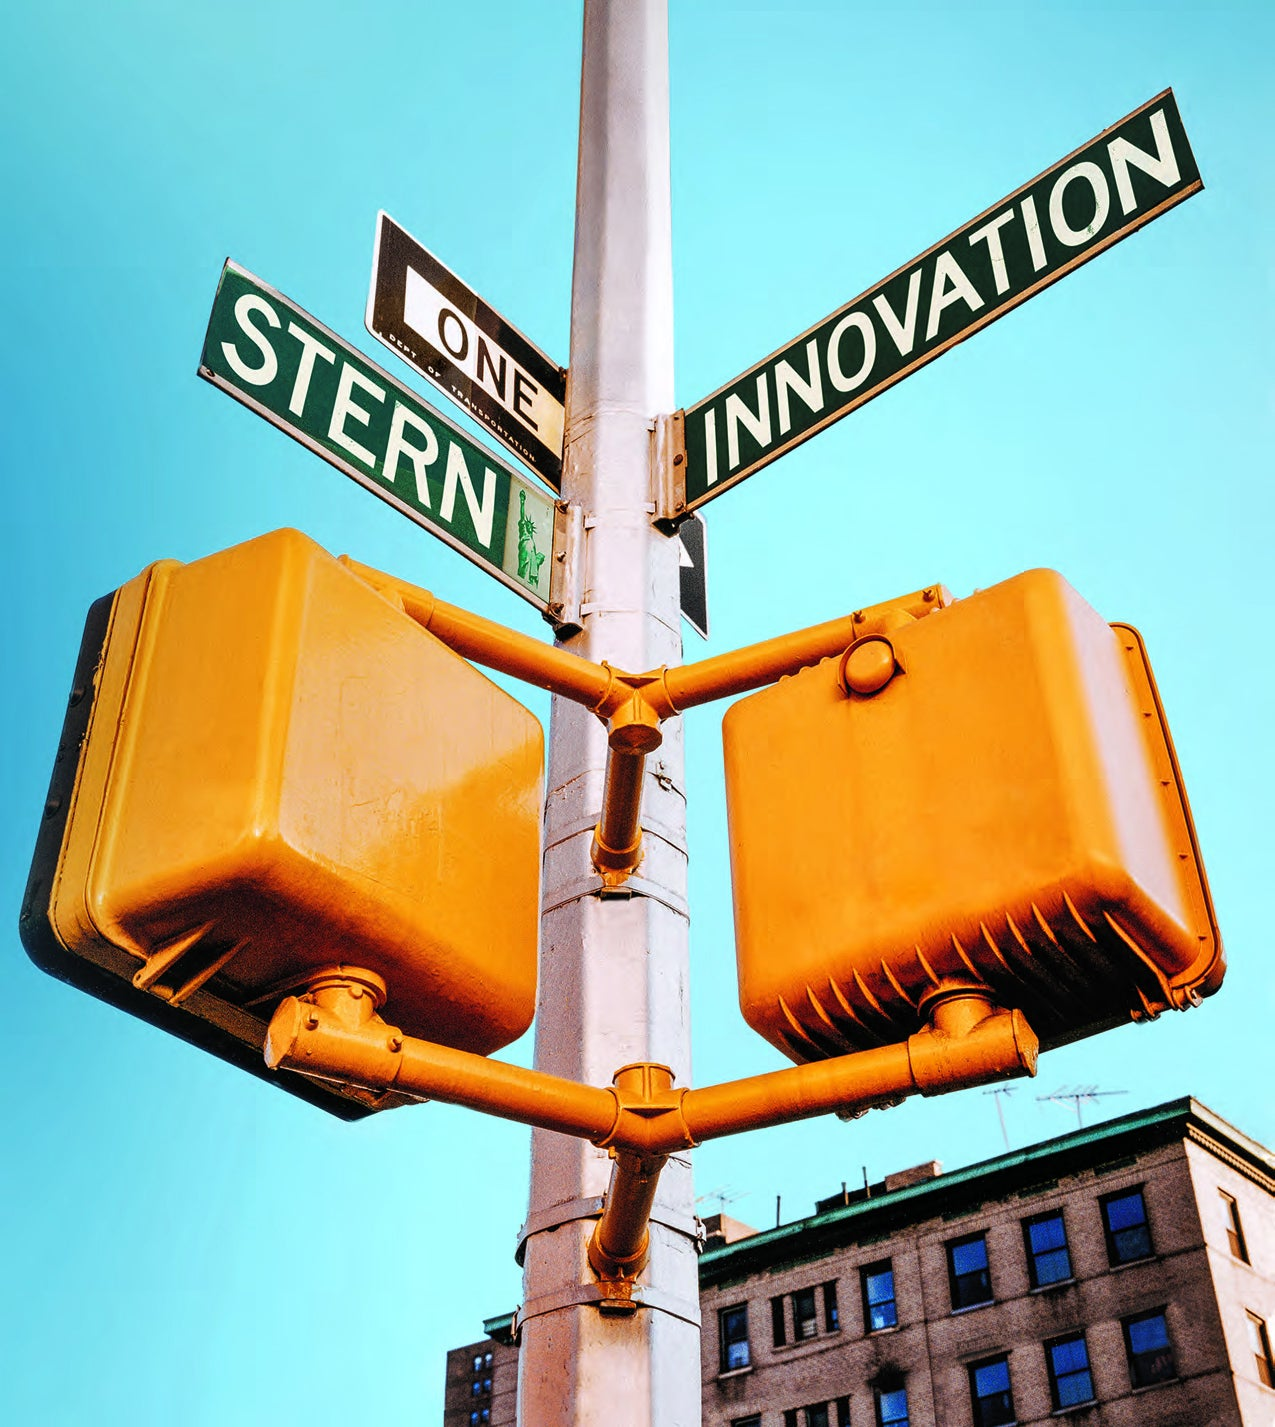 Stern & Innovation